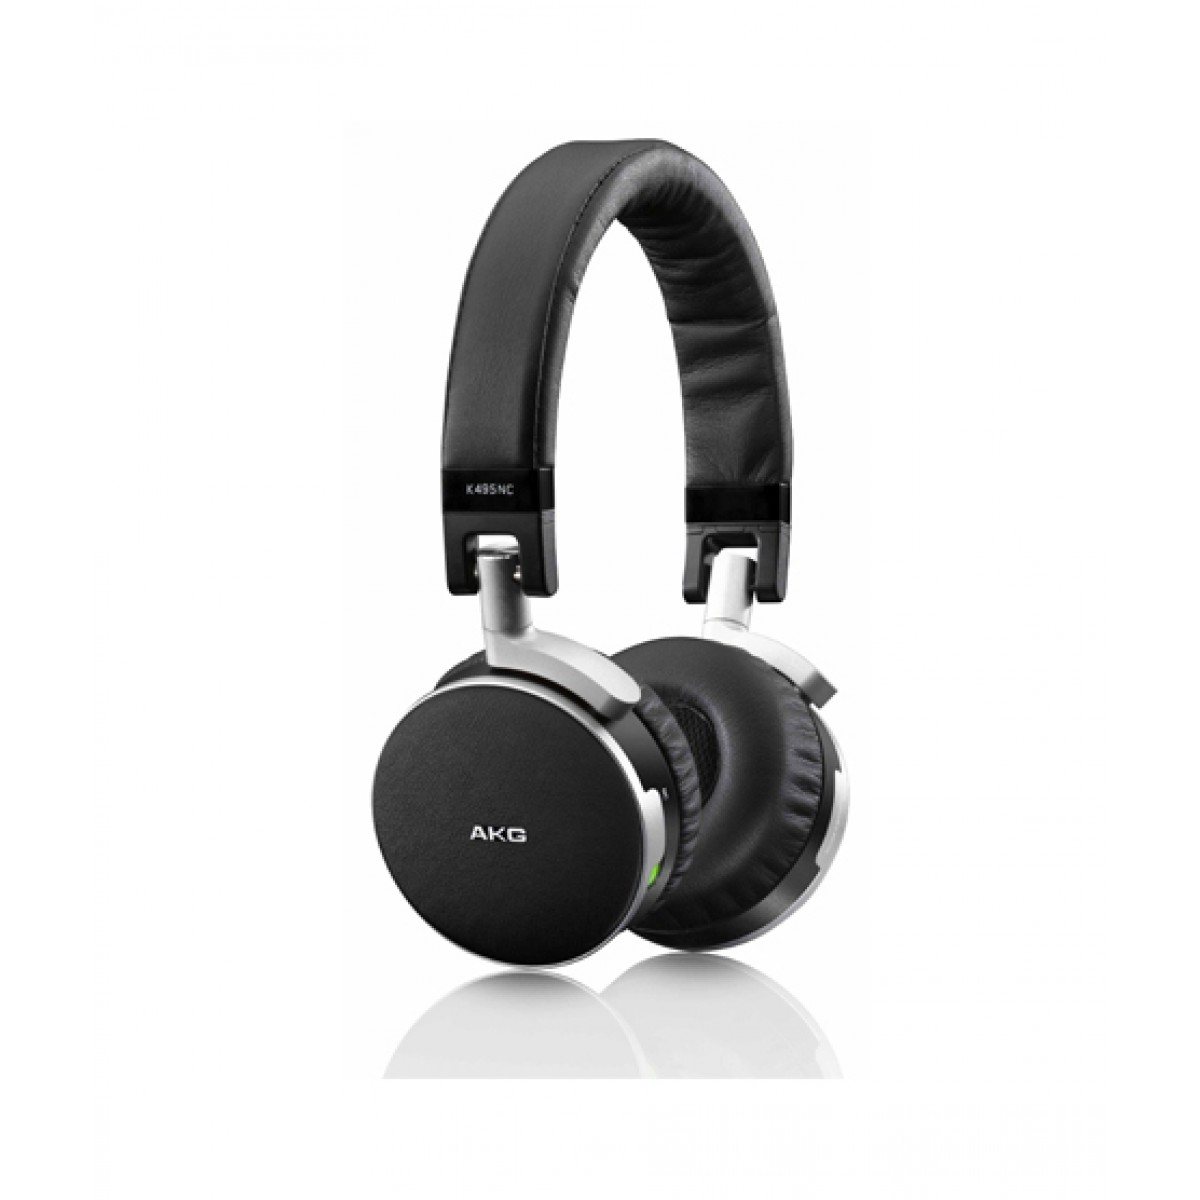 7b14621a5c6 AKG K495 On Ear Headphones Black Price in Pakistan | Buy AKG K495 Premium  Active Noise Cancelling On Ear Headphones | iShopping.pk